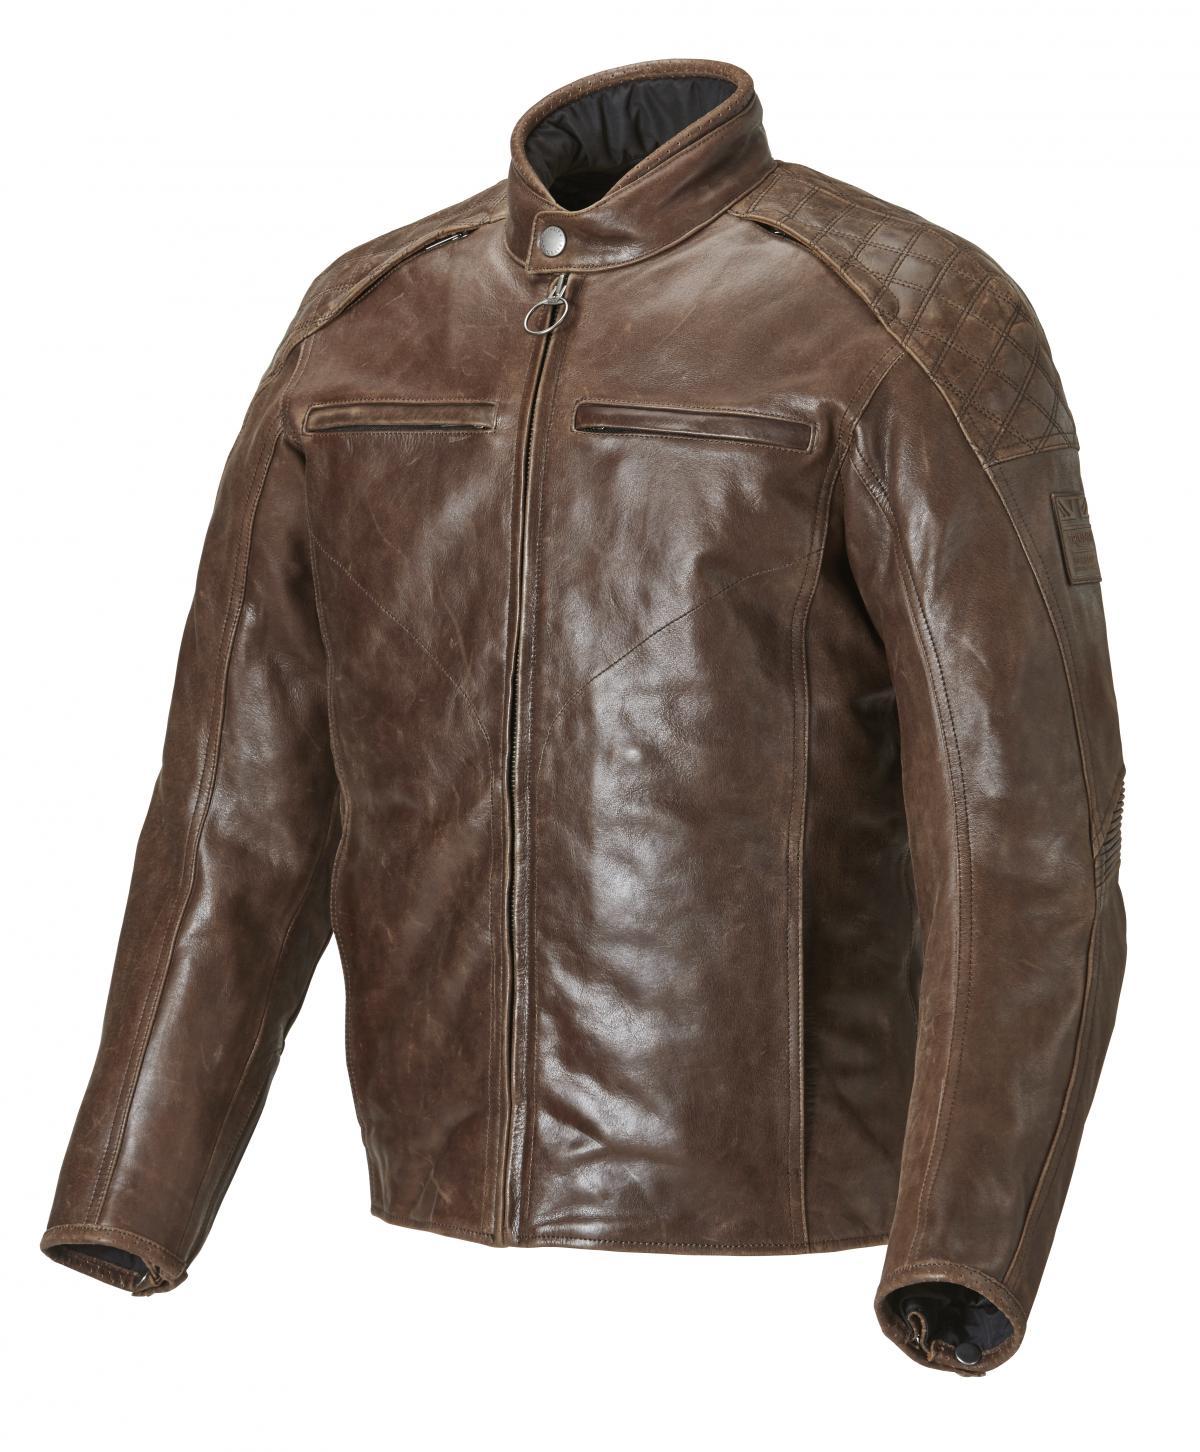 Triumph leather jackets australia